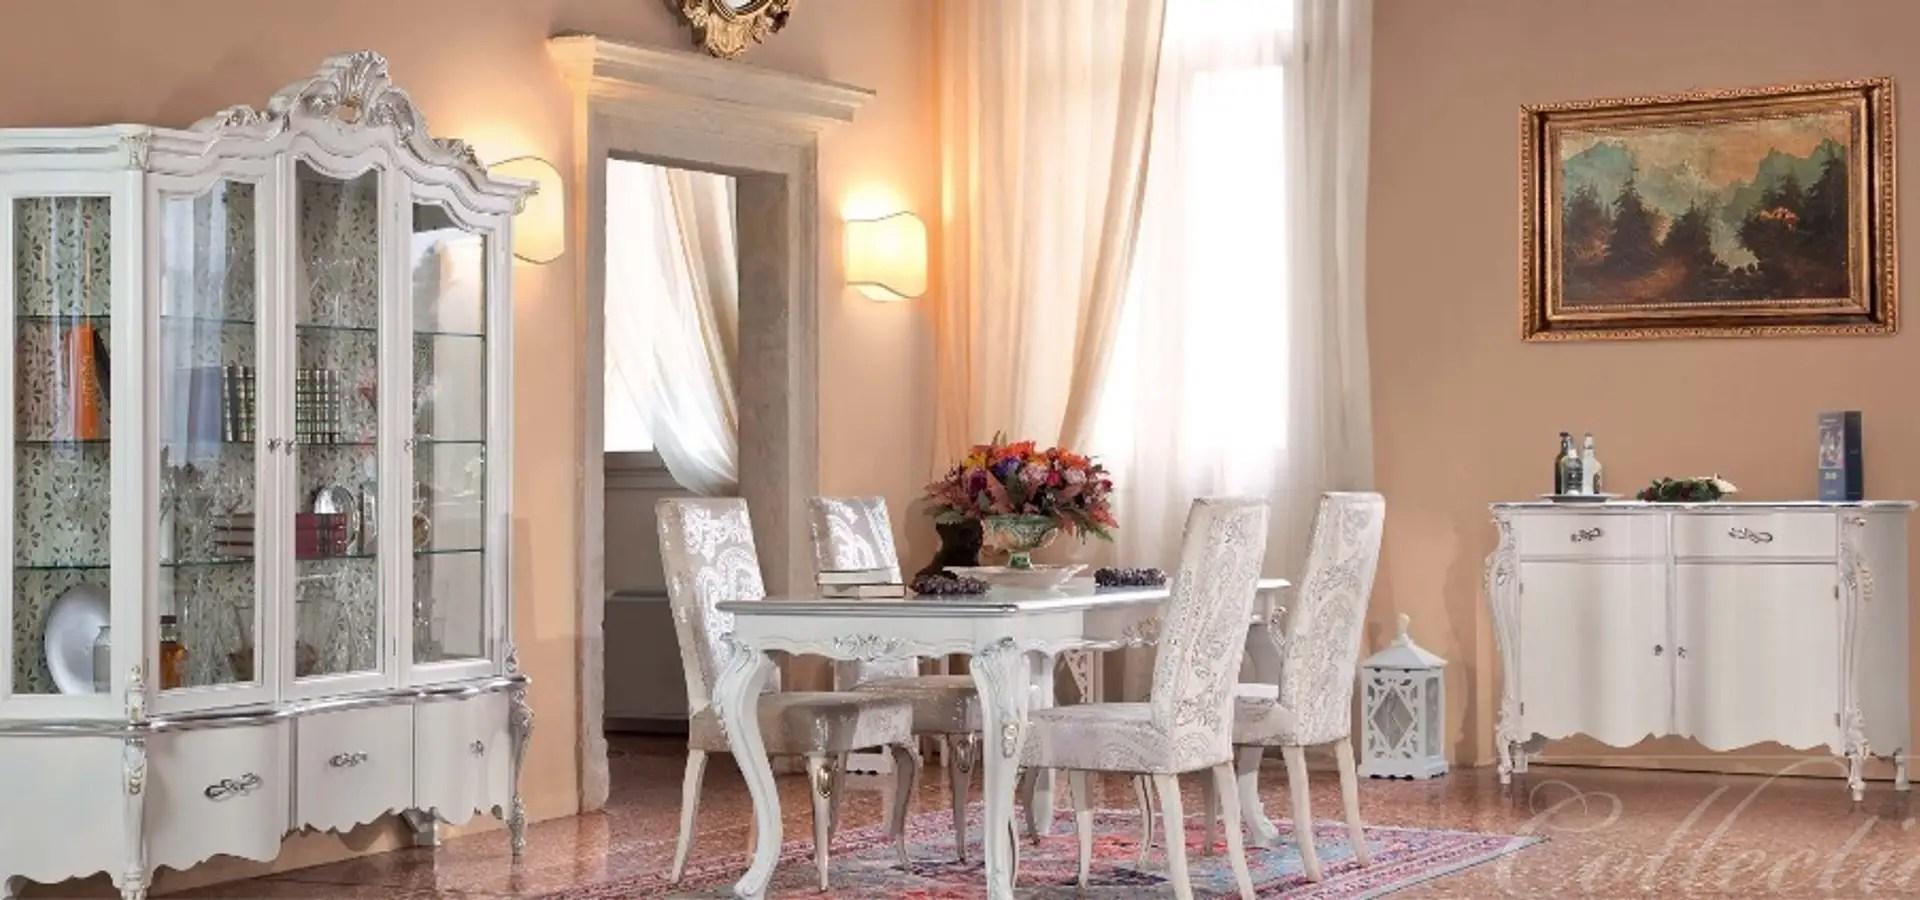 Mobili Per Sala Da Pranzo Ikea : Sala da pranzo shabby ikea la casa di lu la sala da pranzo